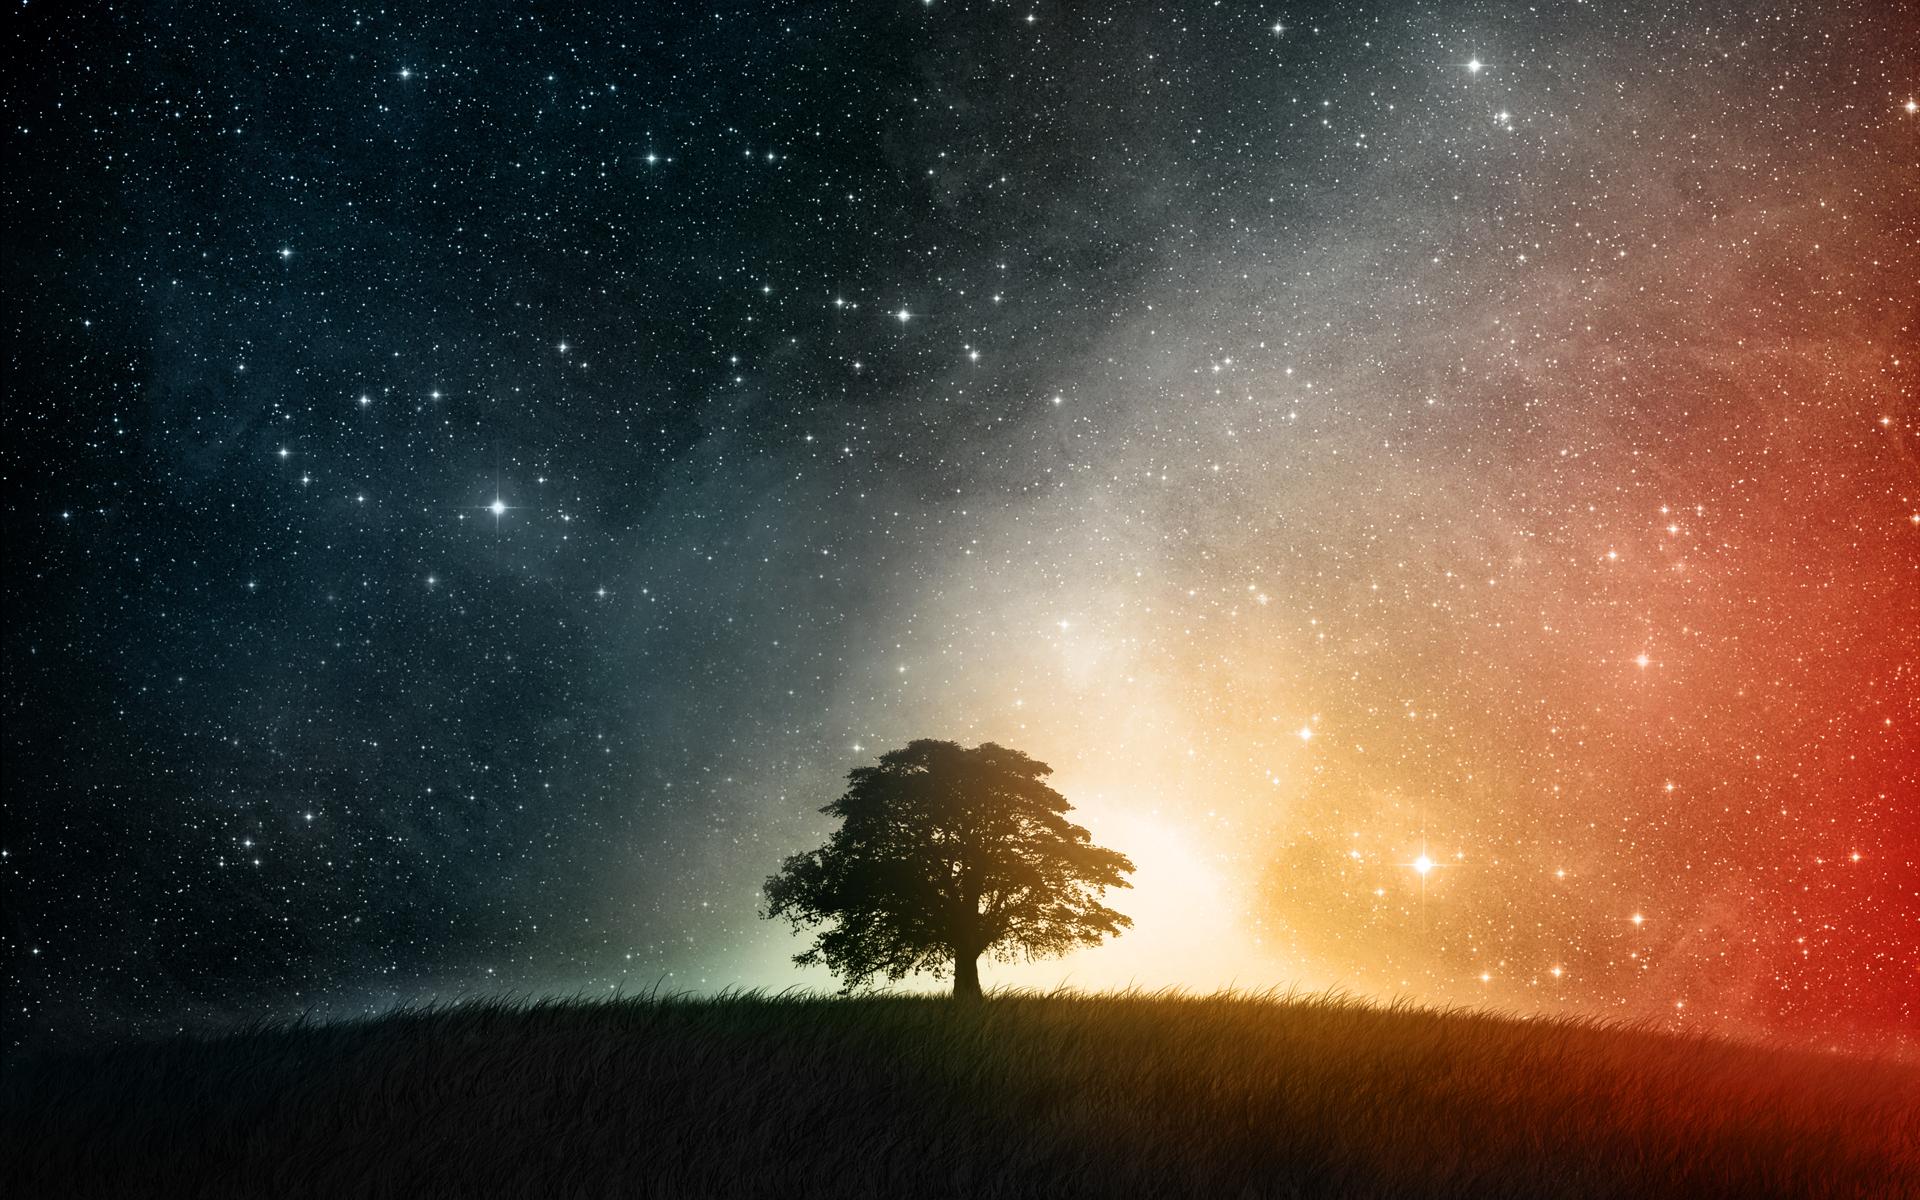 Grass Landscape Sky Space Stars Tree 1920x1200